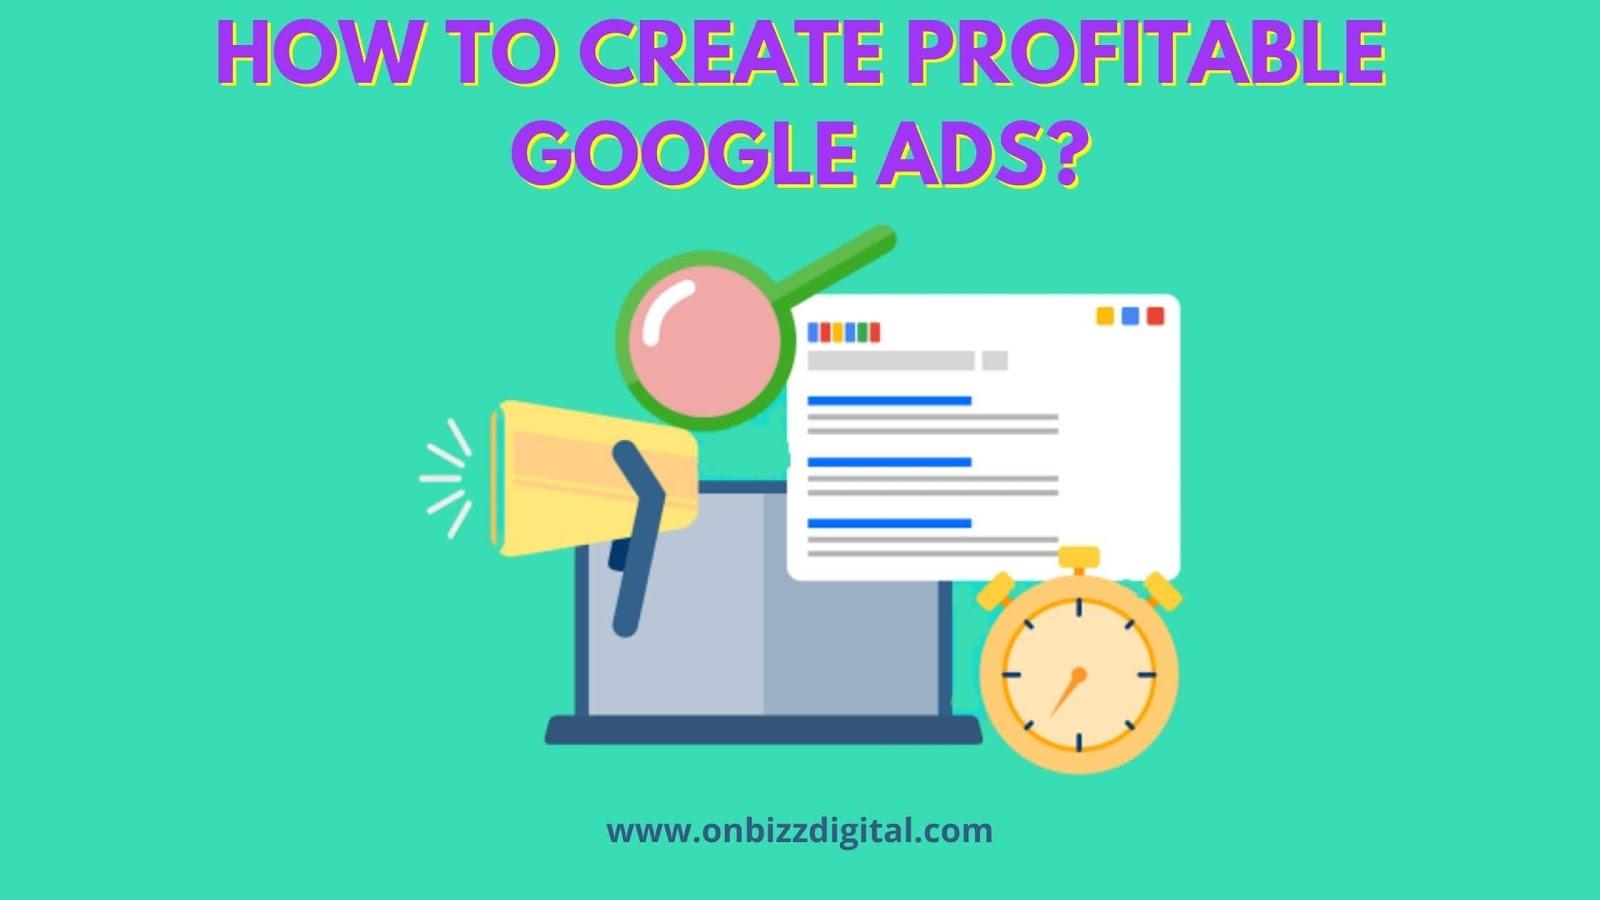 Profitable Google Ads